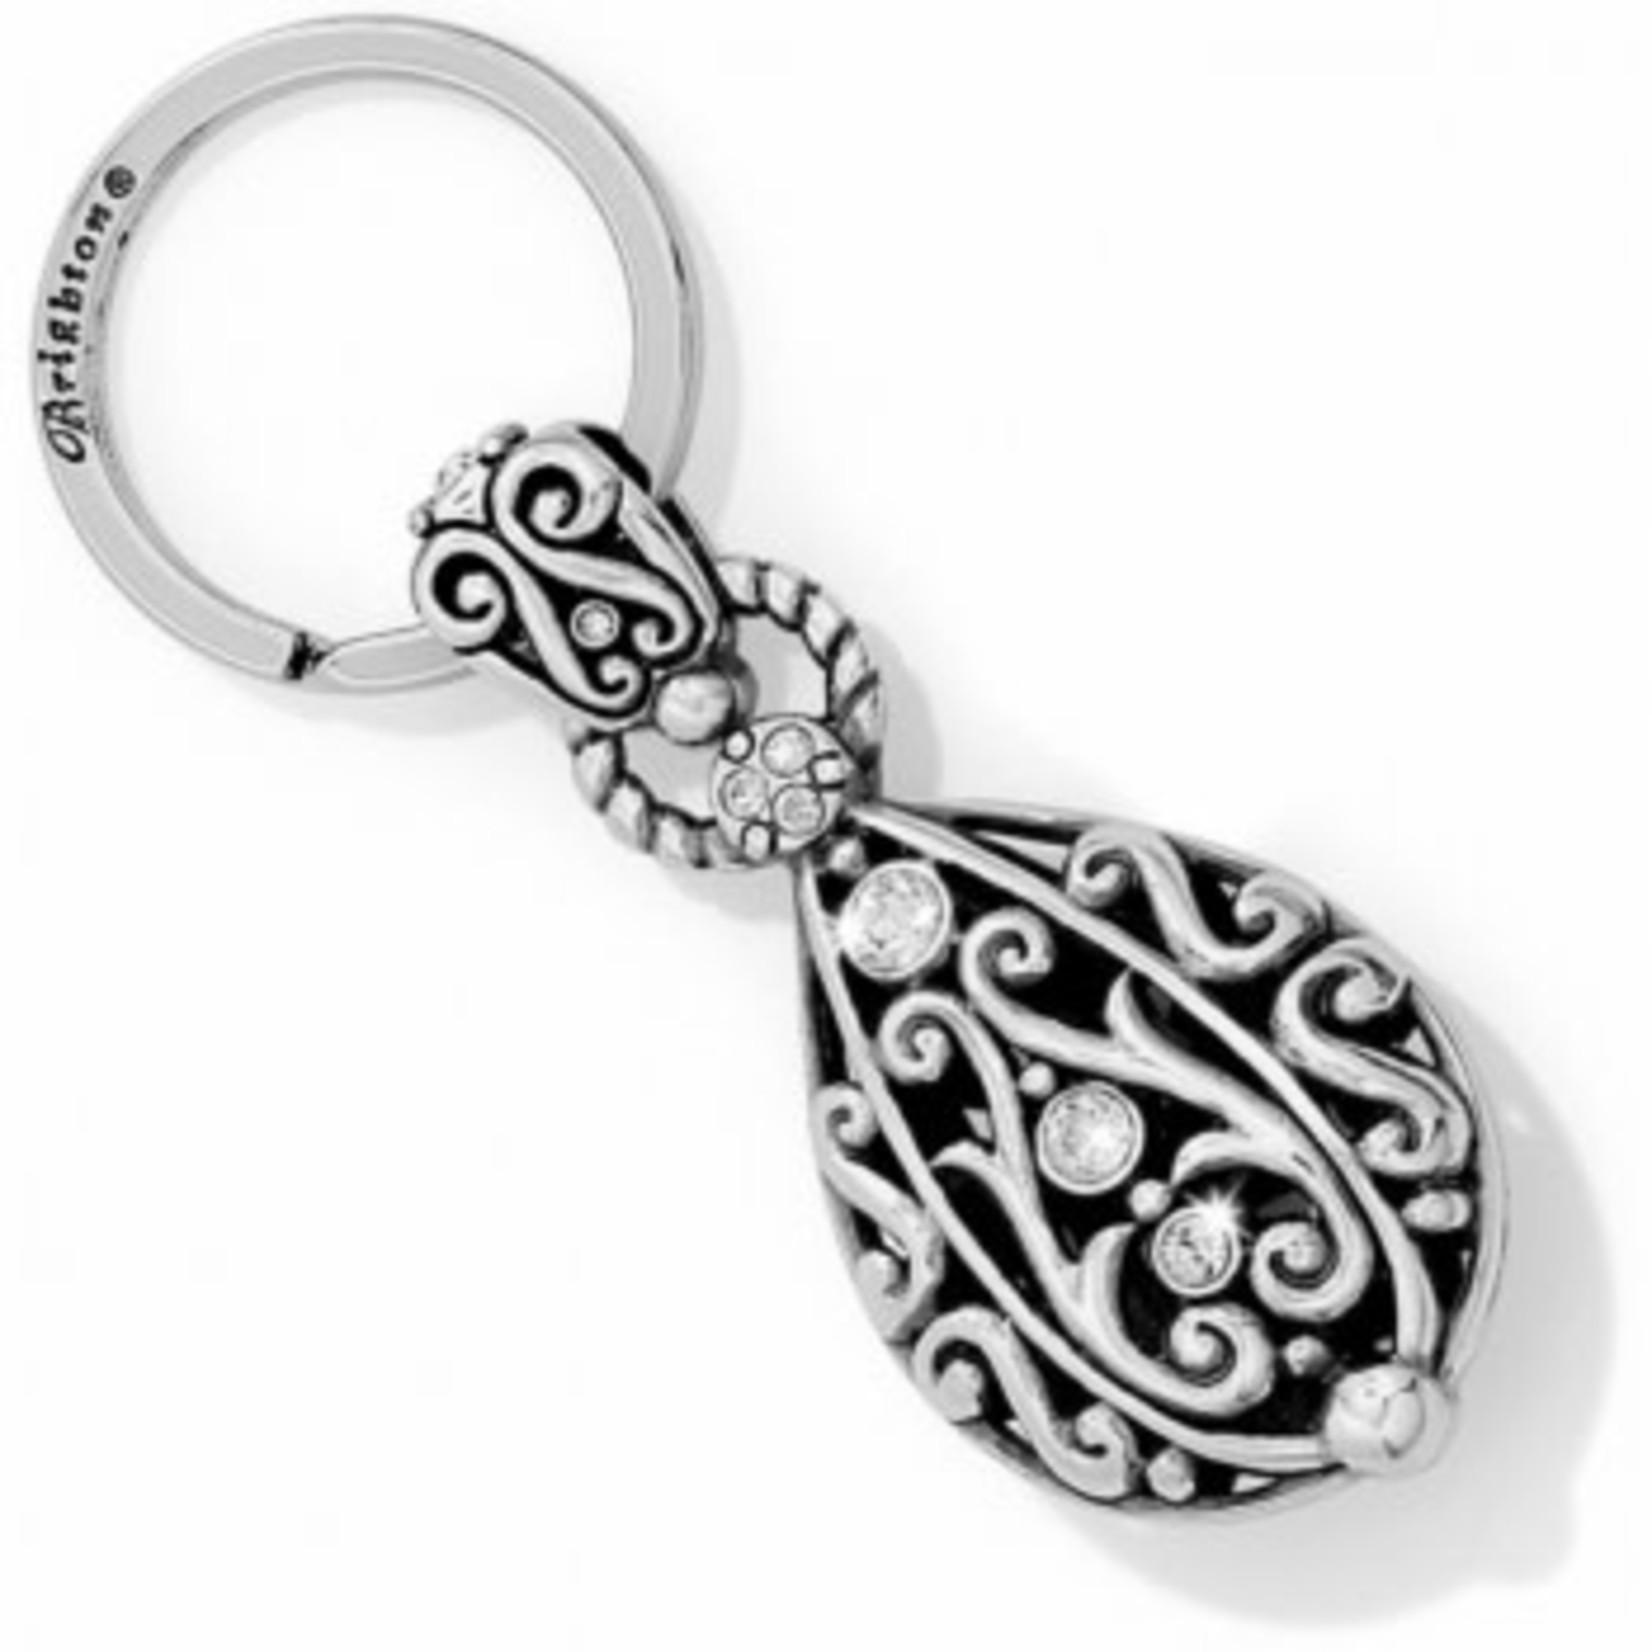 Brighton Bibi Scroll Key Fob